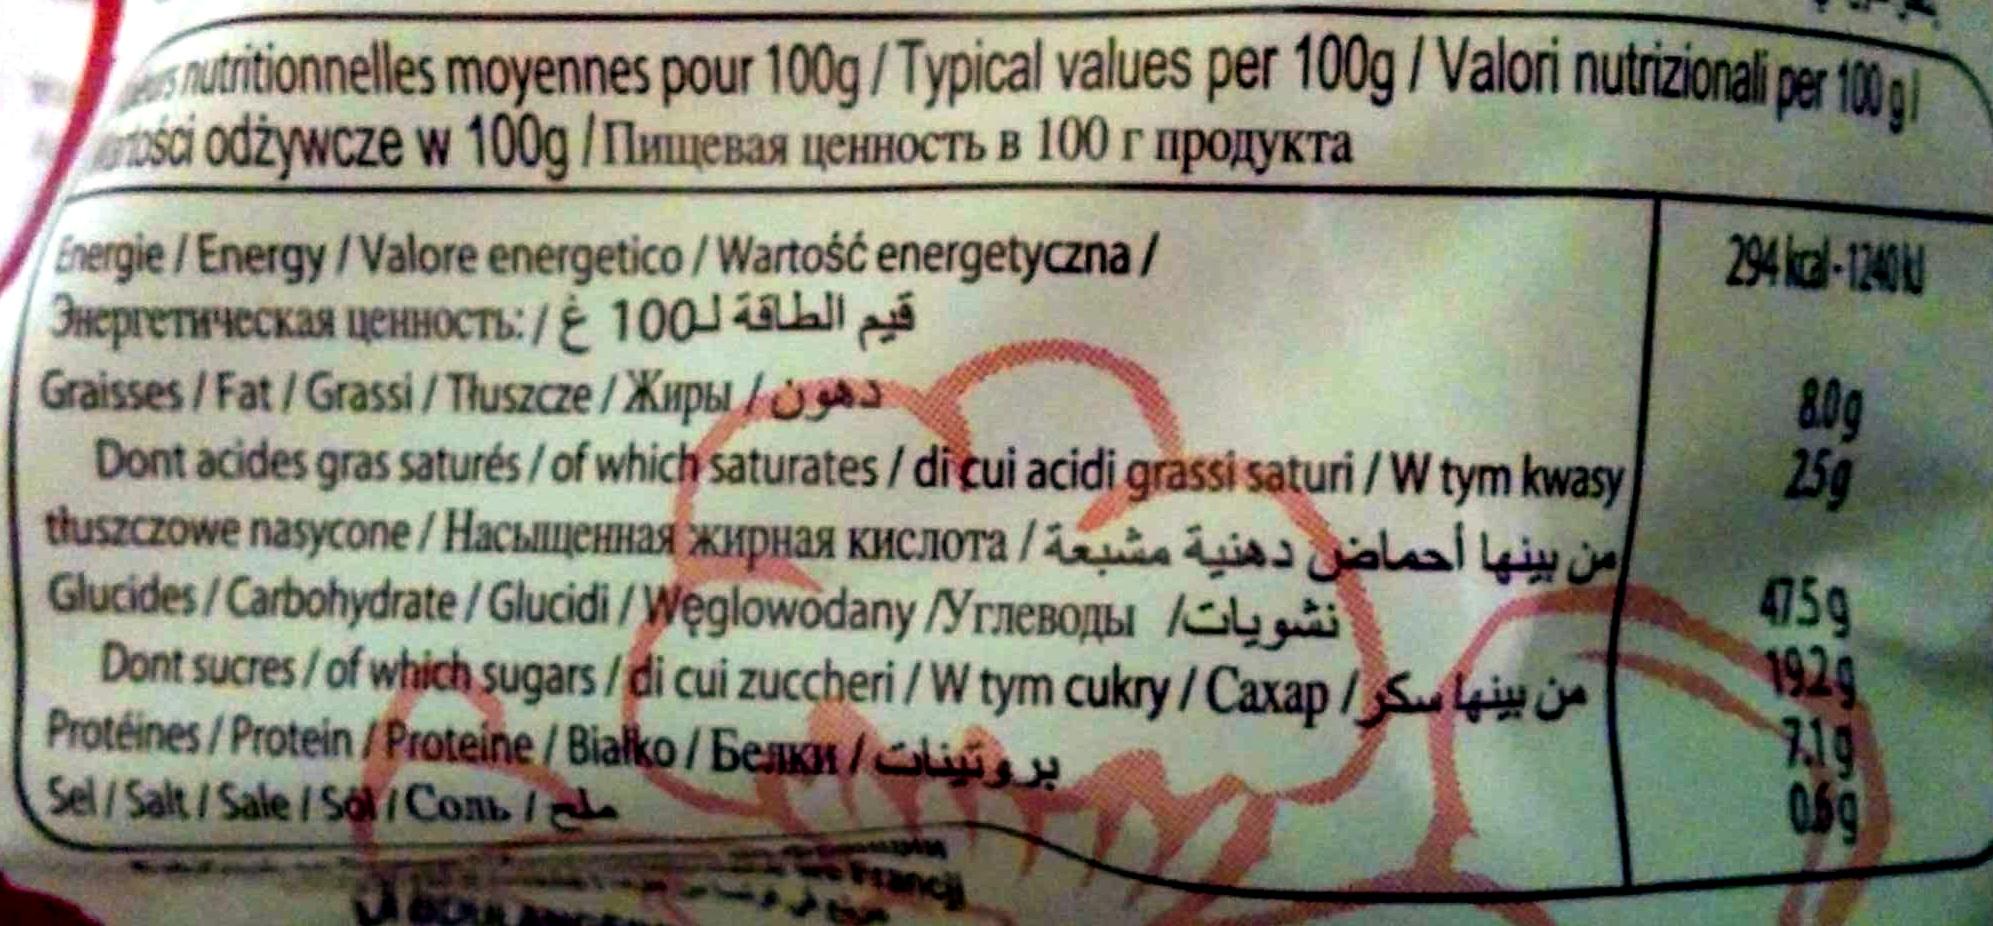 6 spiralo's chocolat - Valori nutrizionali - fr